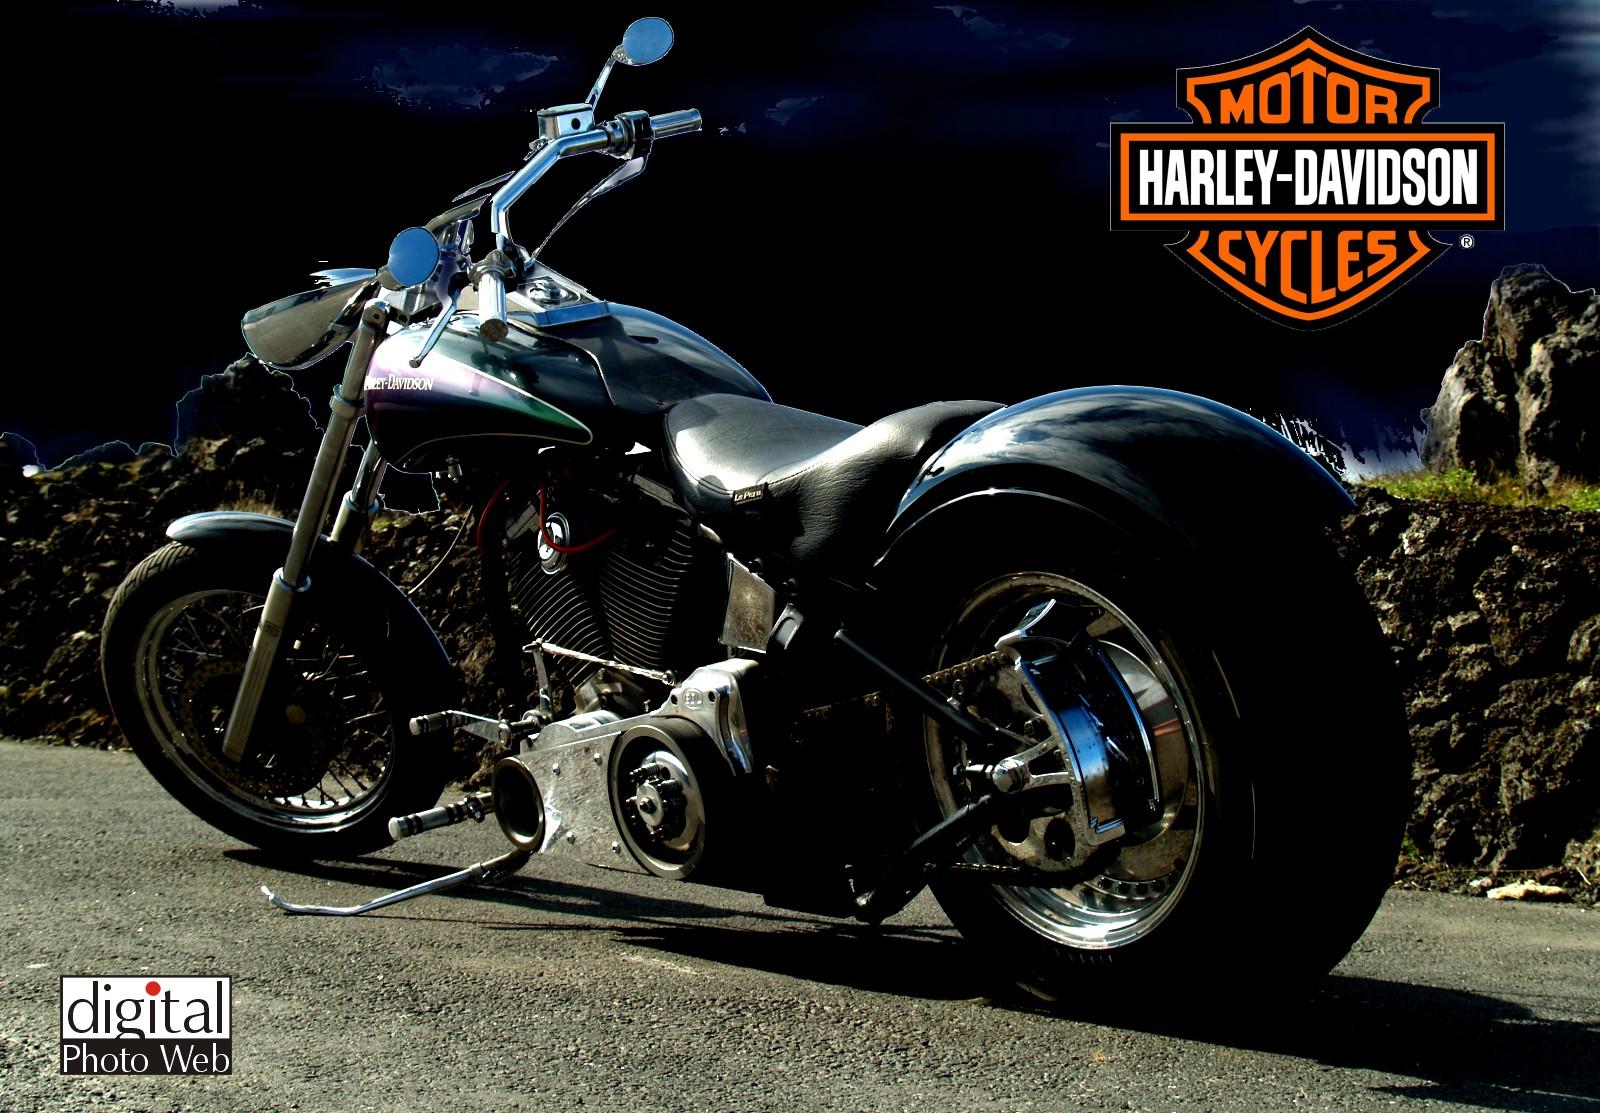 Harley Davidson Bikes HD Wallpapers Download Harley 1600x1113